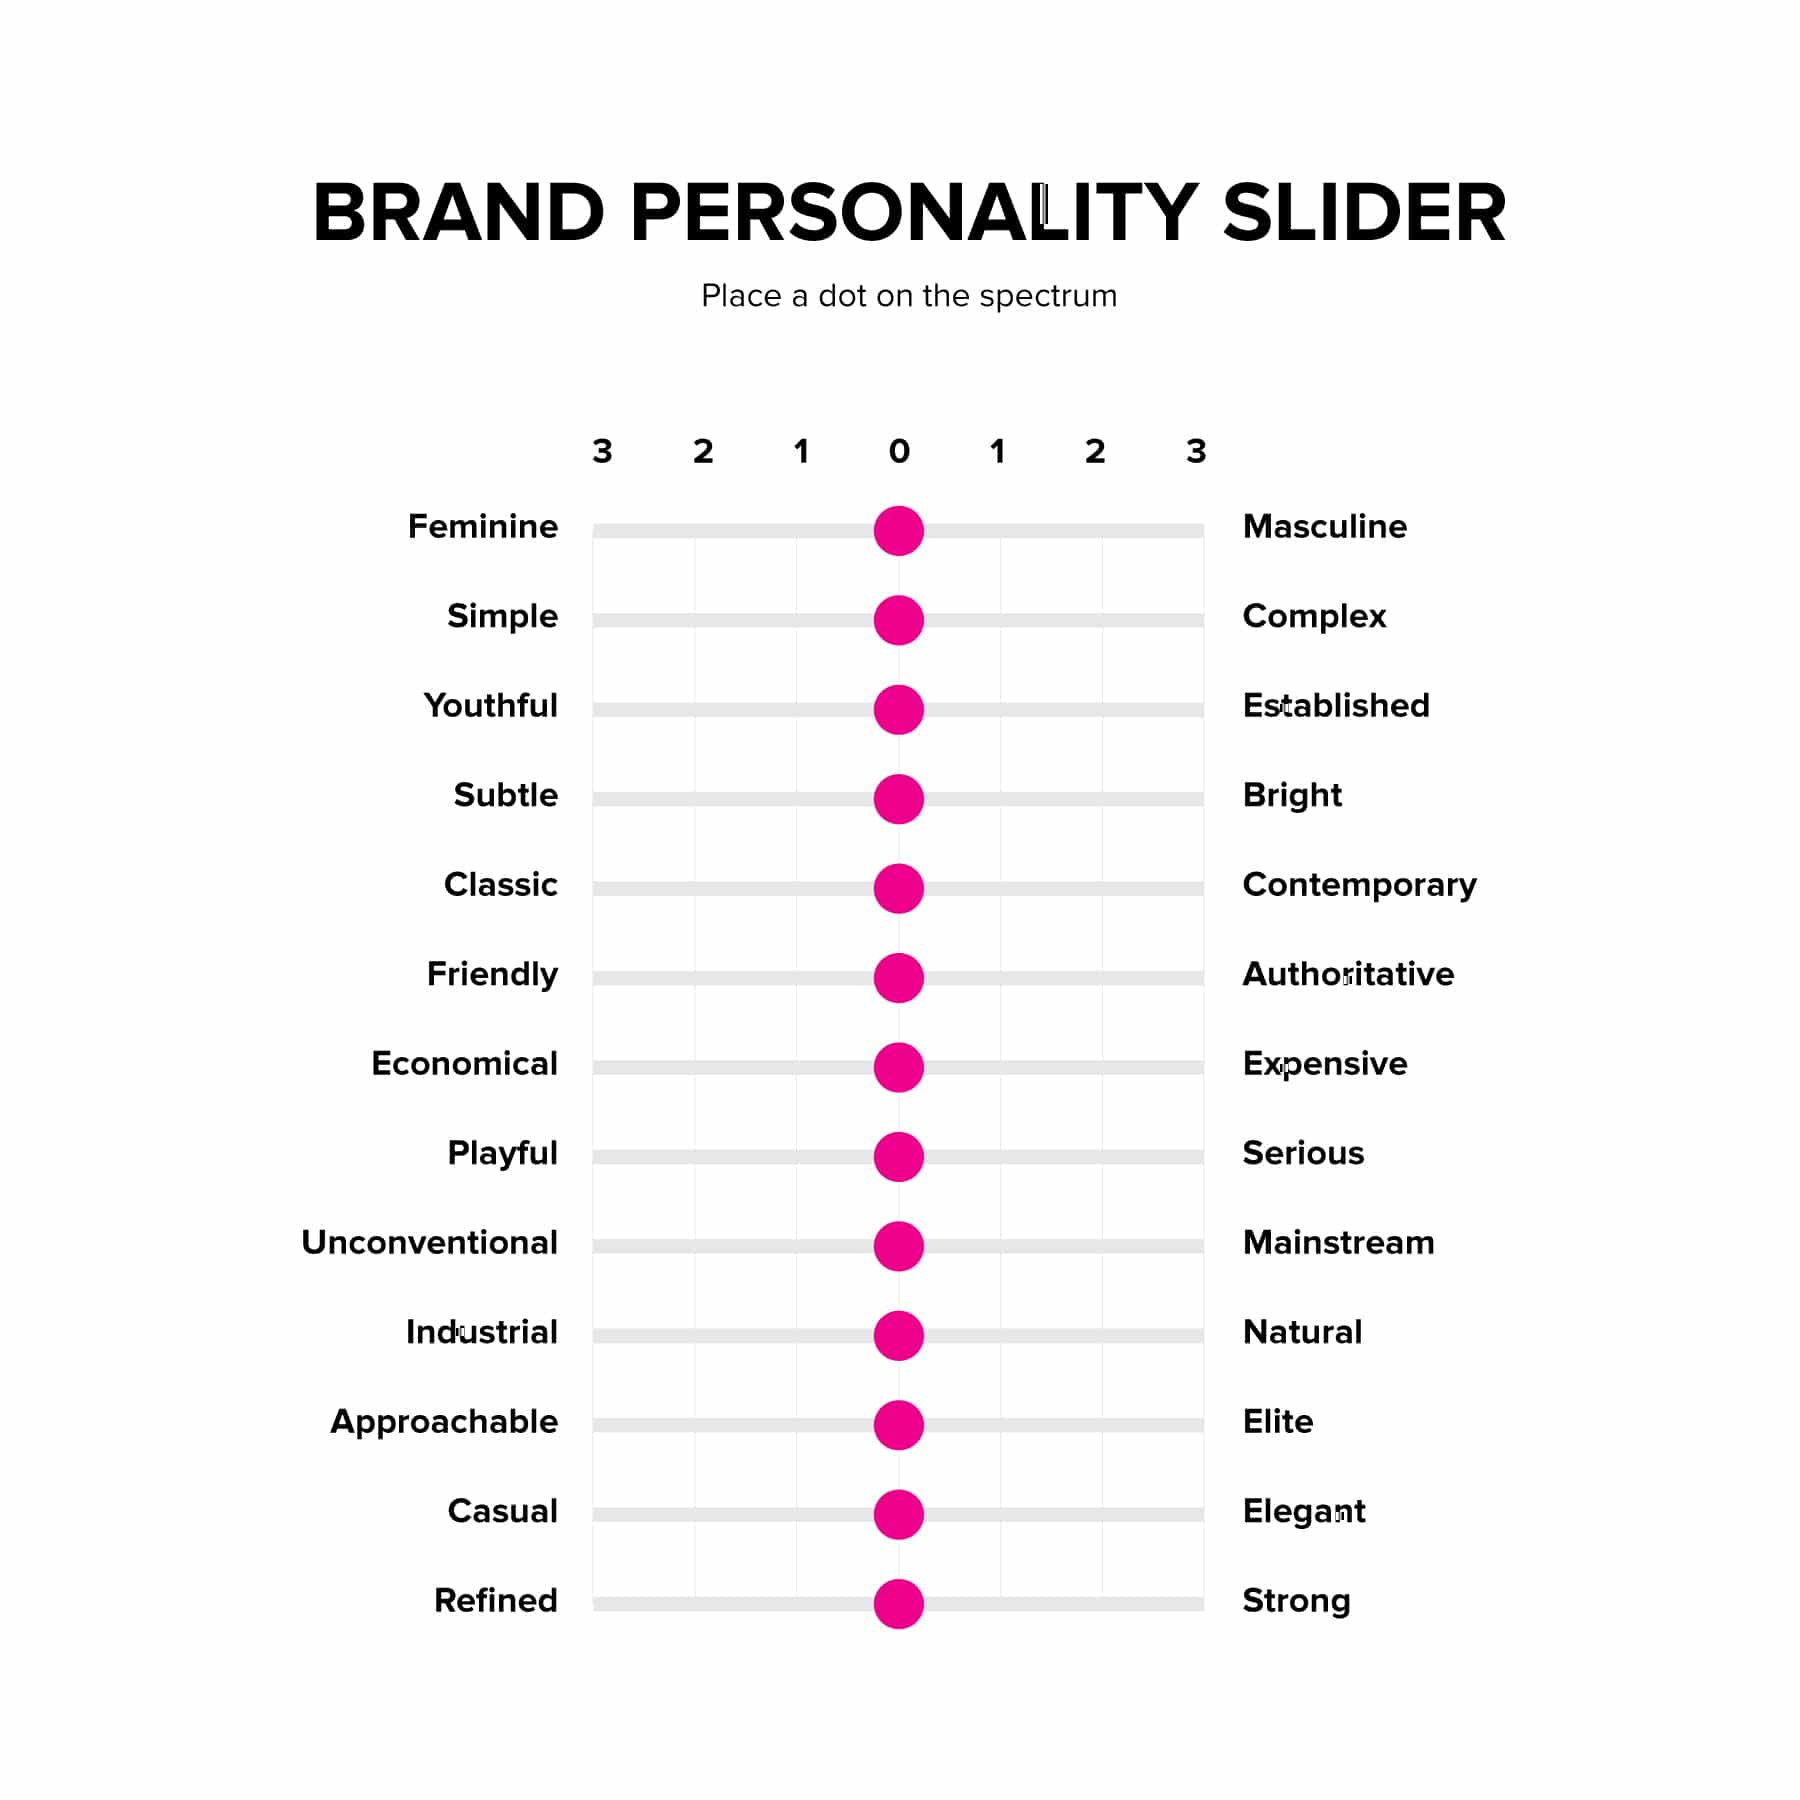 Brand Personality Matrix Slider